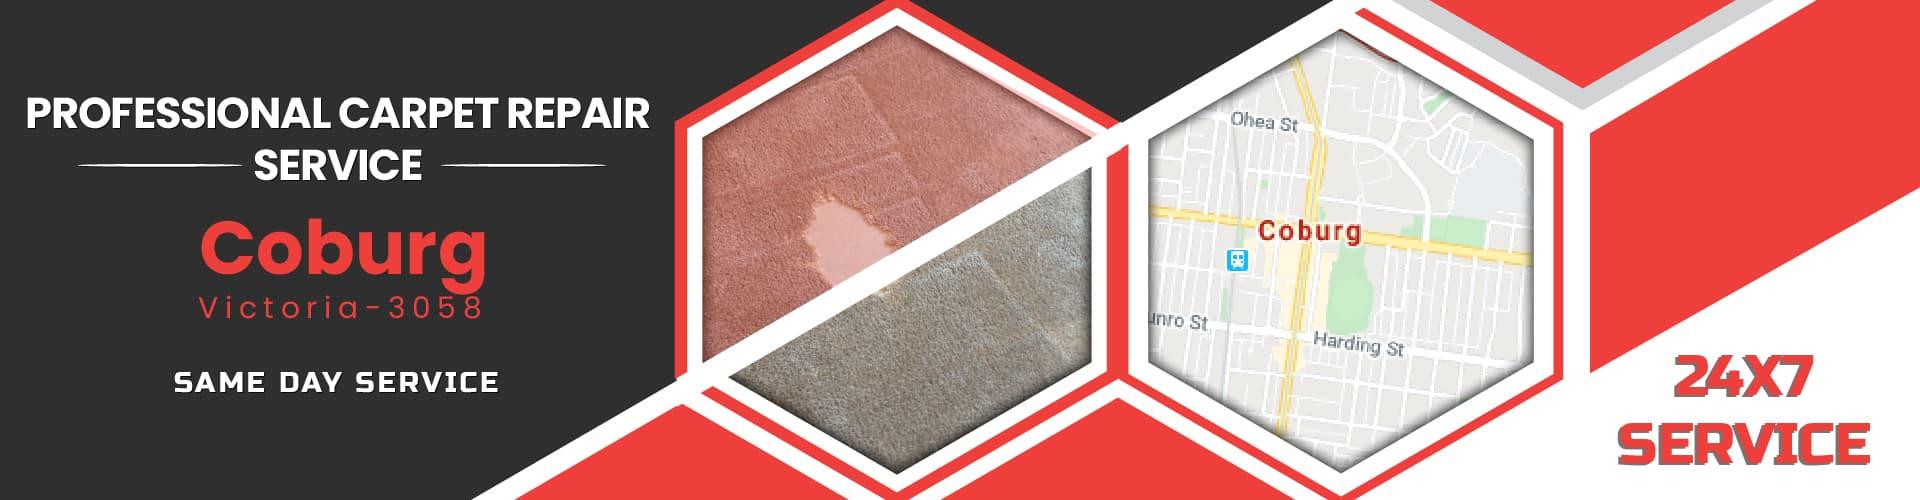 Carpet Repair Coburg